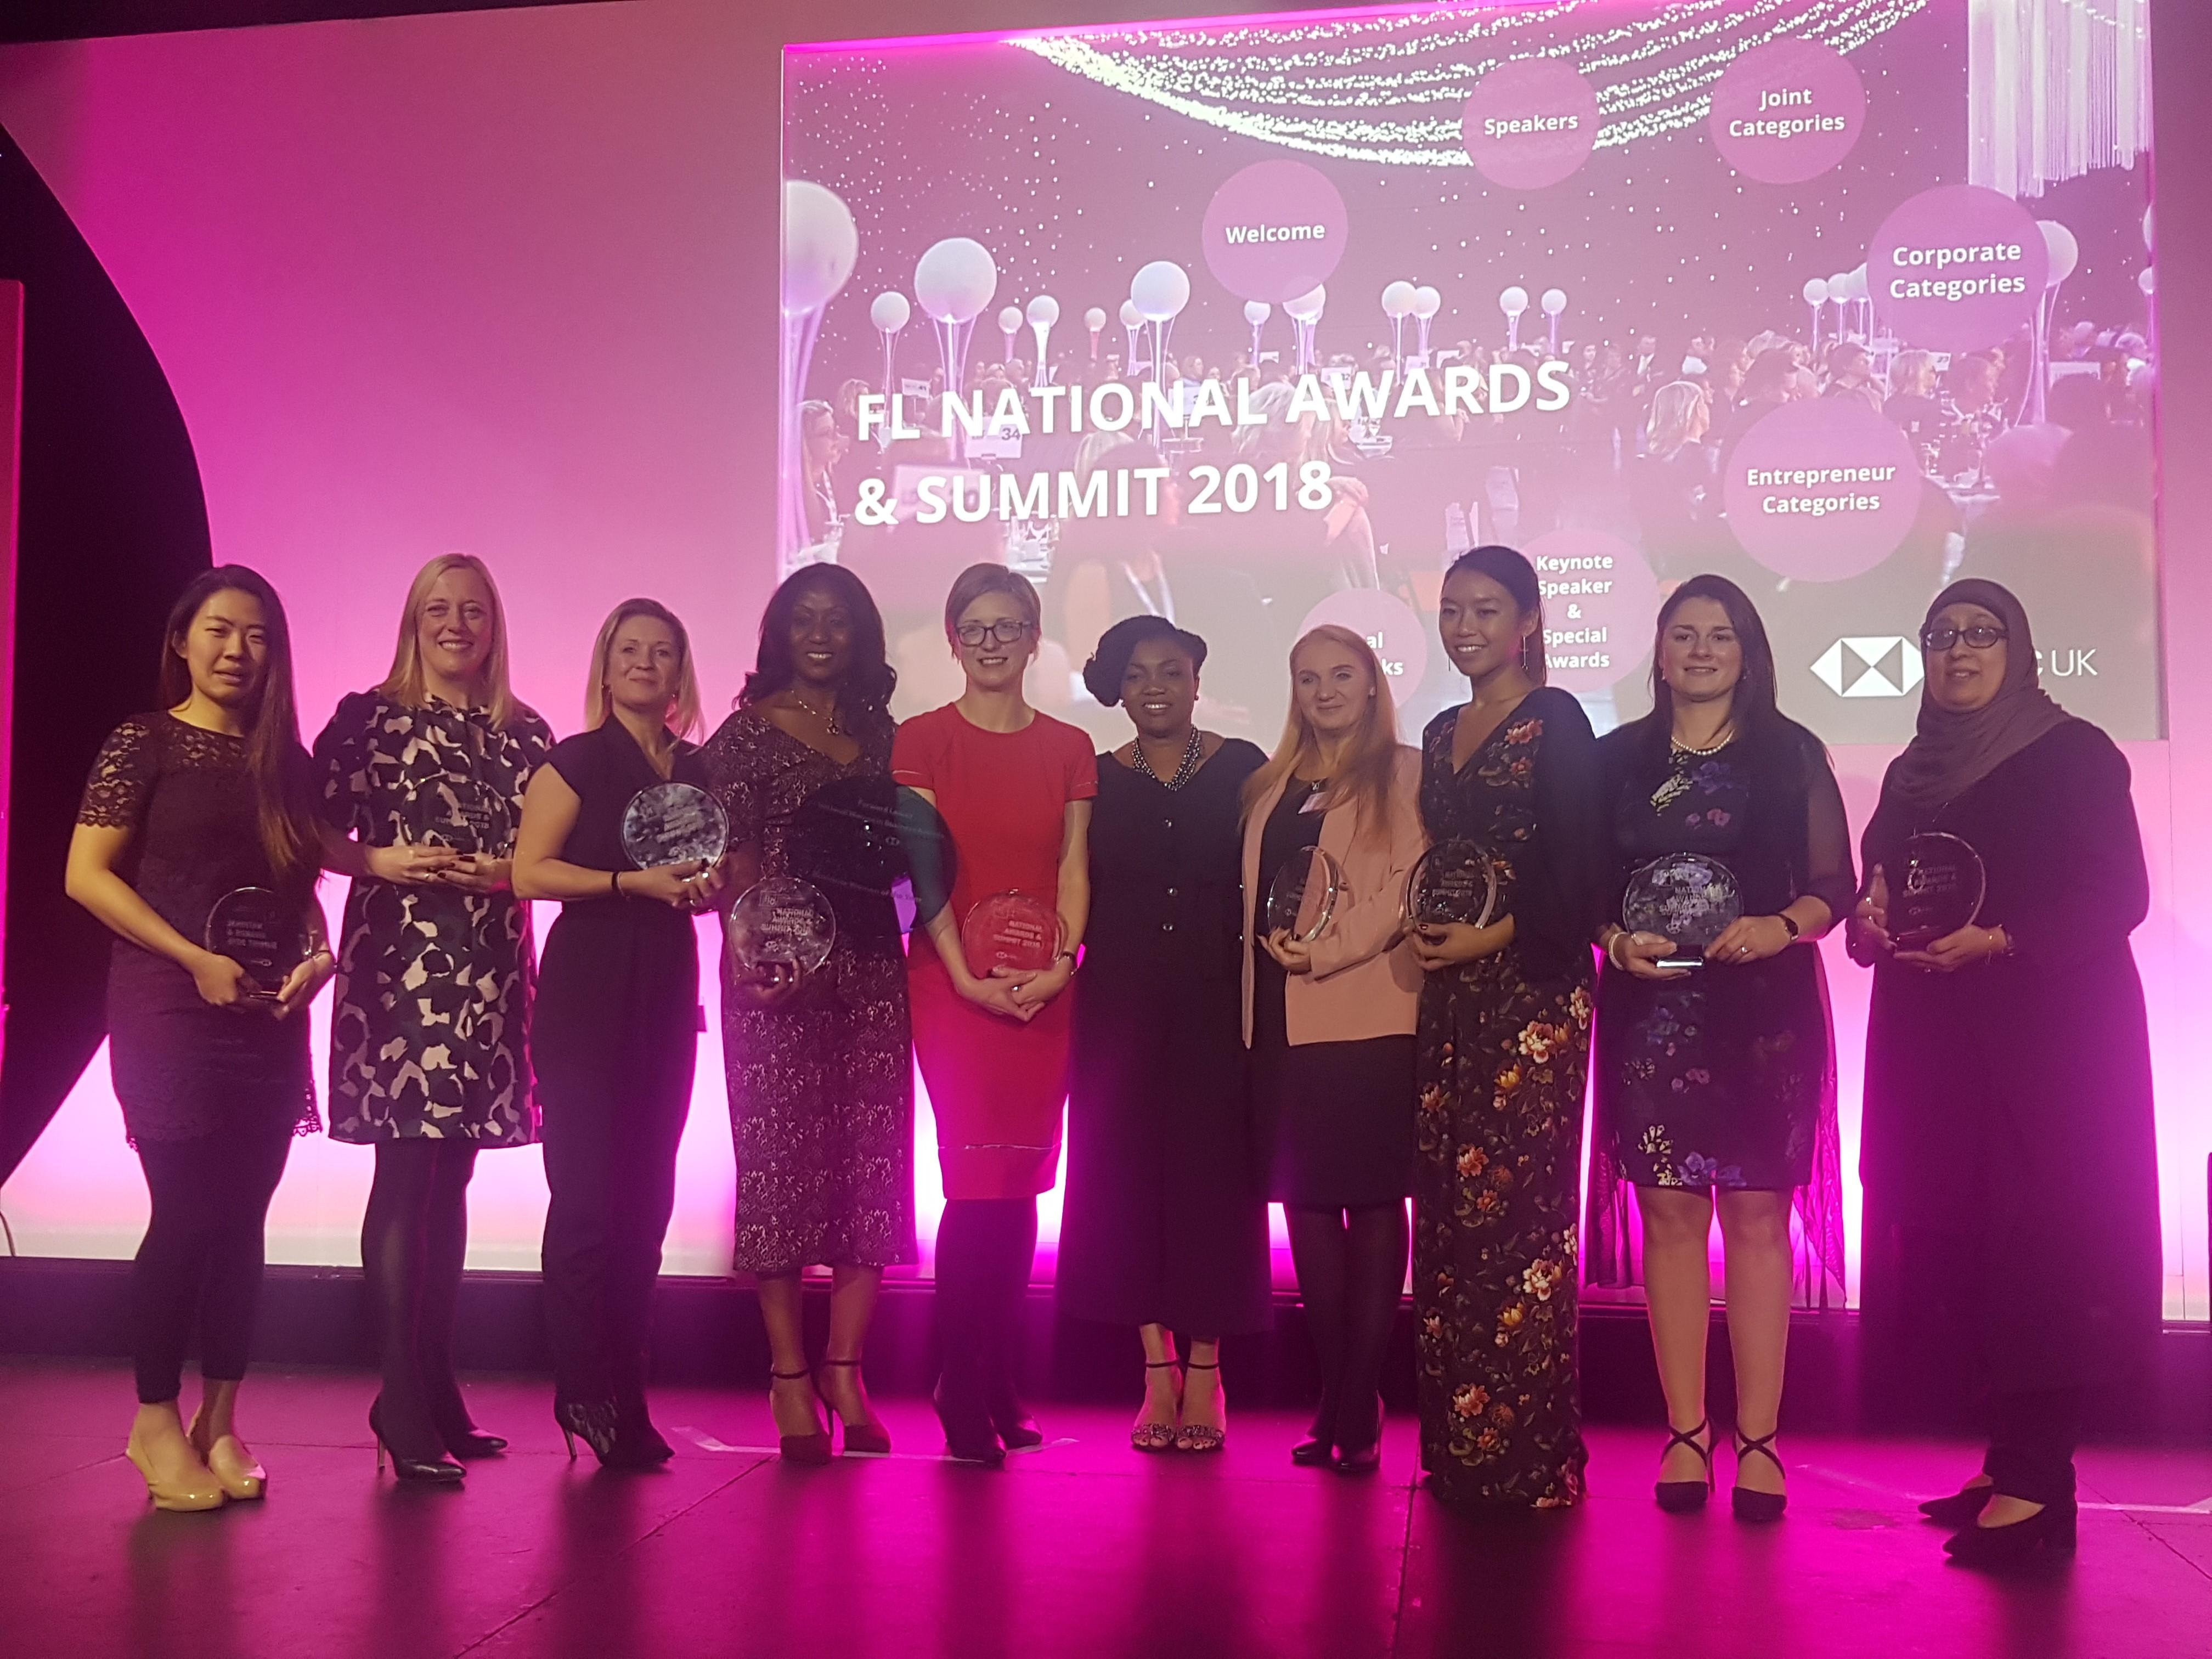 Joanne Bass Wins Forward Ladies Female Entrepreneur Award